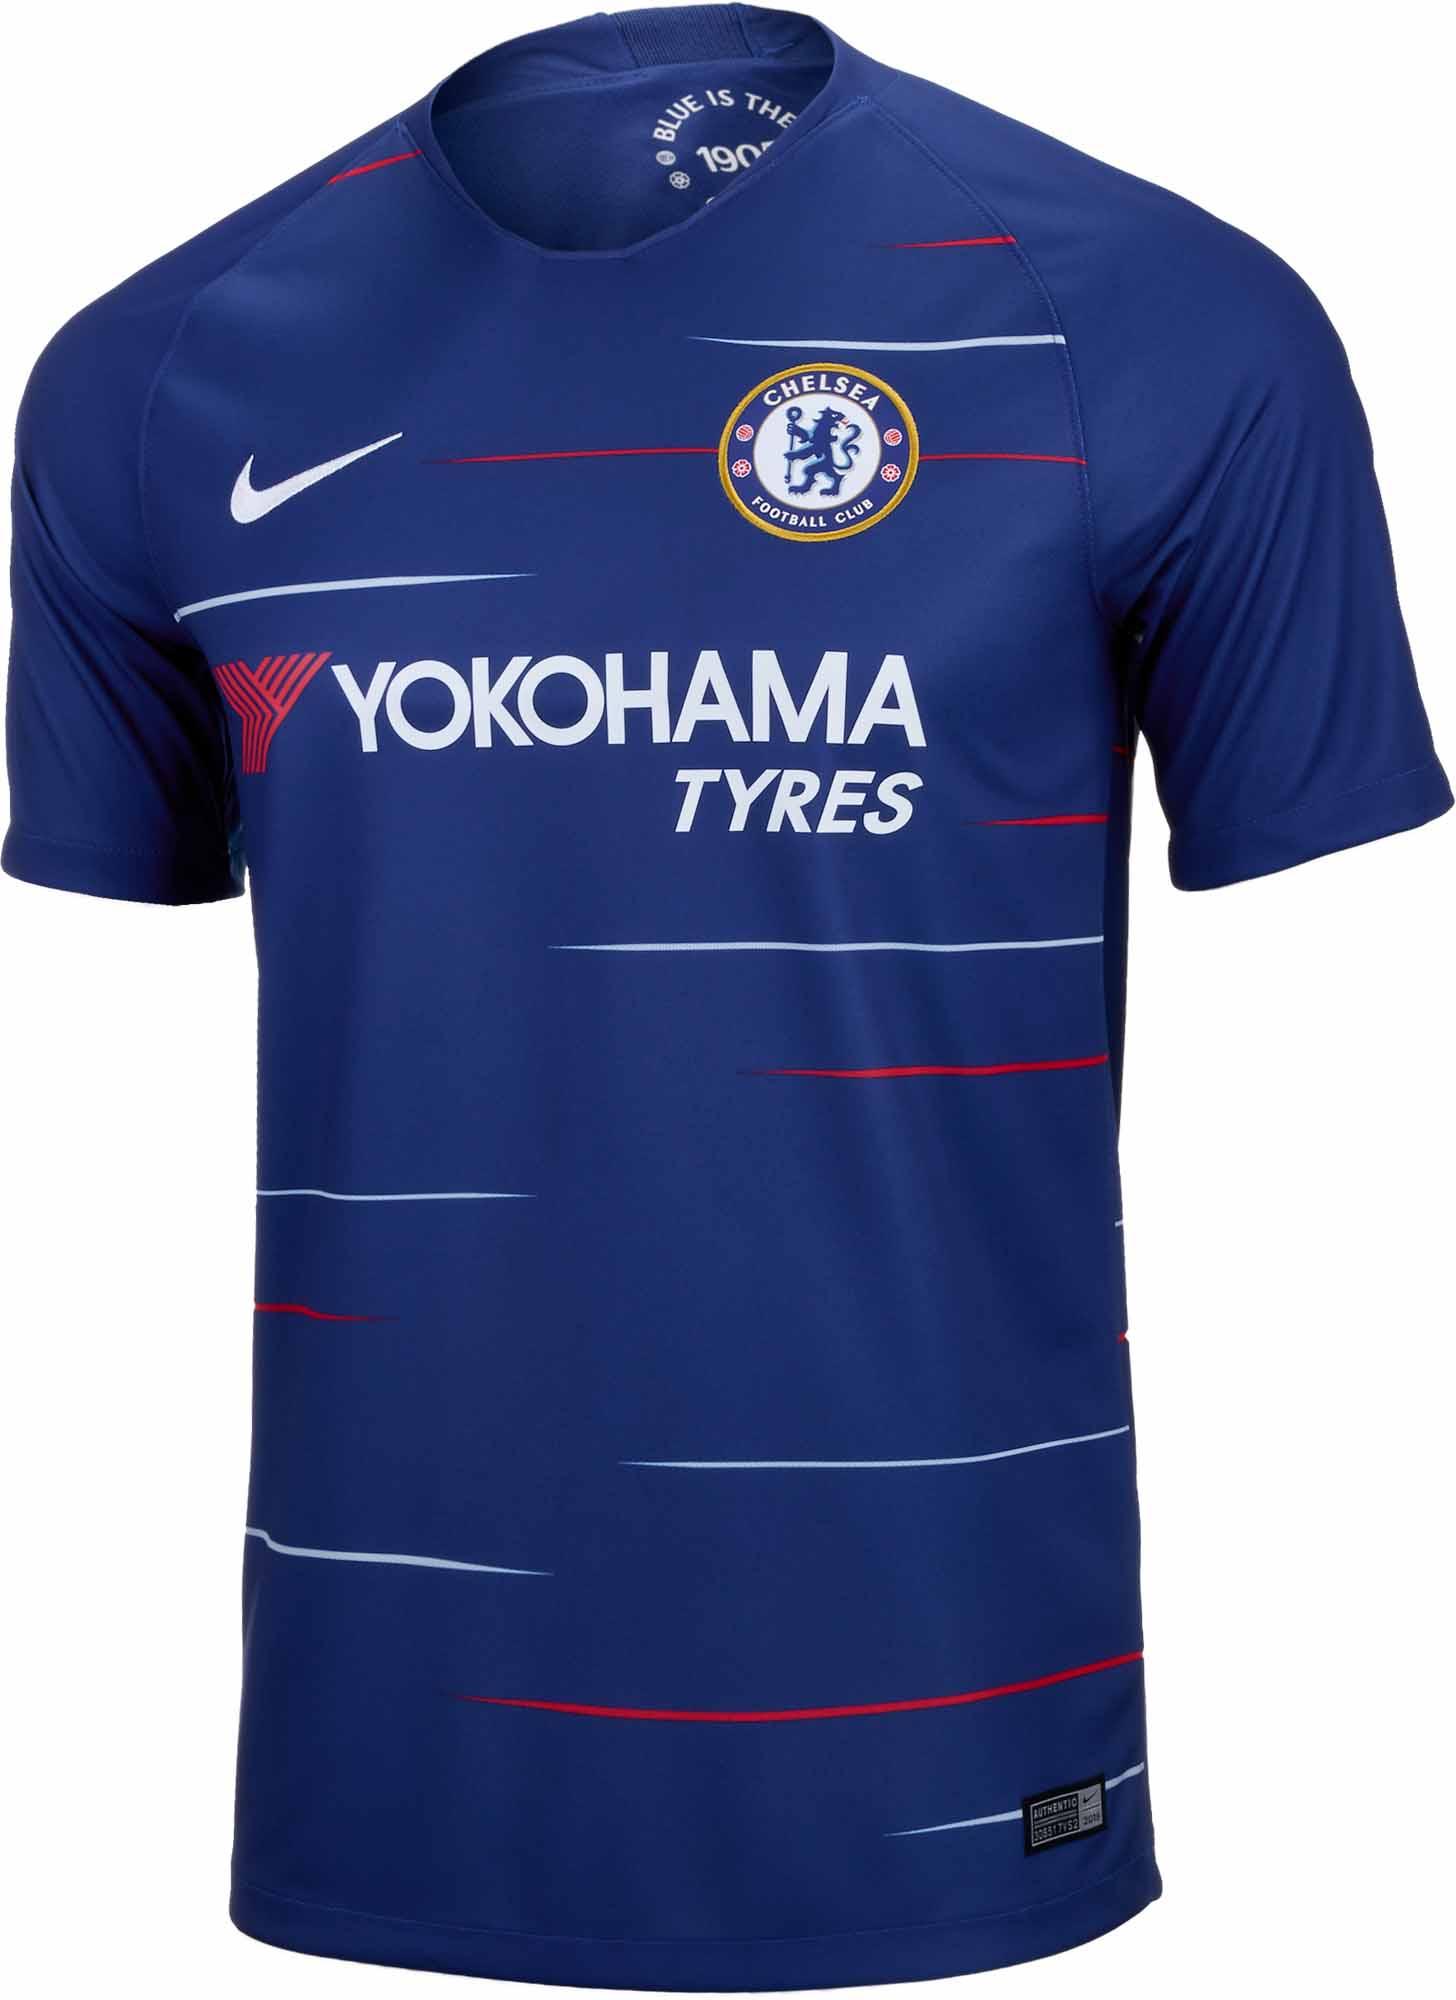 2b3cc8d9f1e Nike Chelsea Home Jersey - Youth 2018-19 - SoccerPro